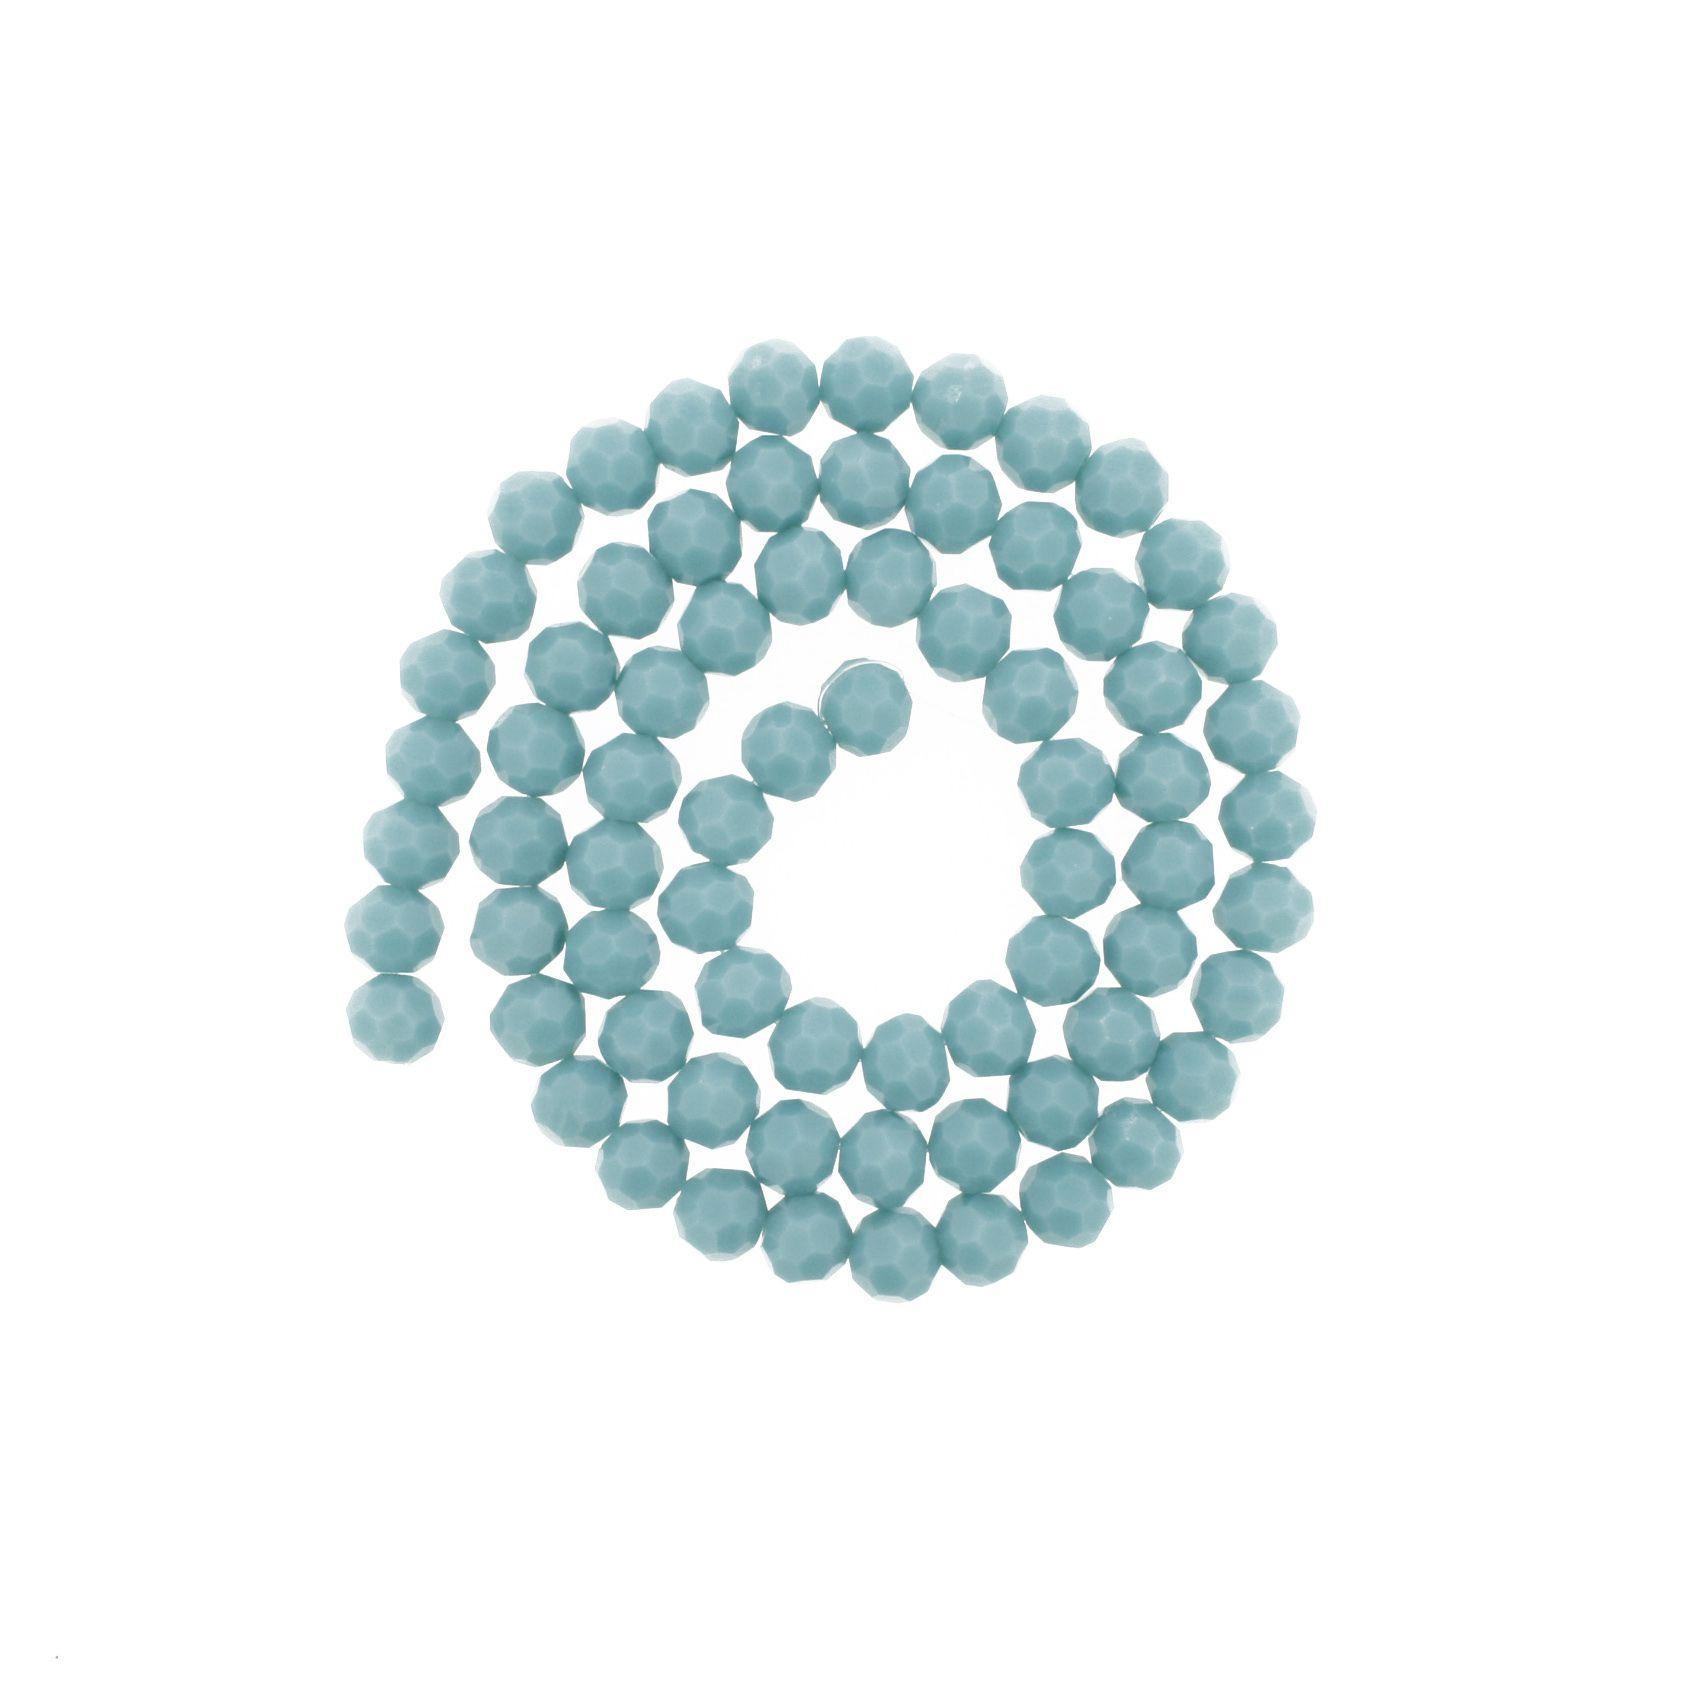 Fio de Cristal - Premium® - Verde Turquesa - 8mm  - Stéphanie Bijoux® - Peças para Bijuterias e Artesanato